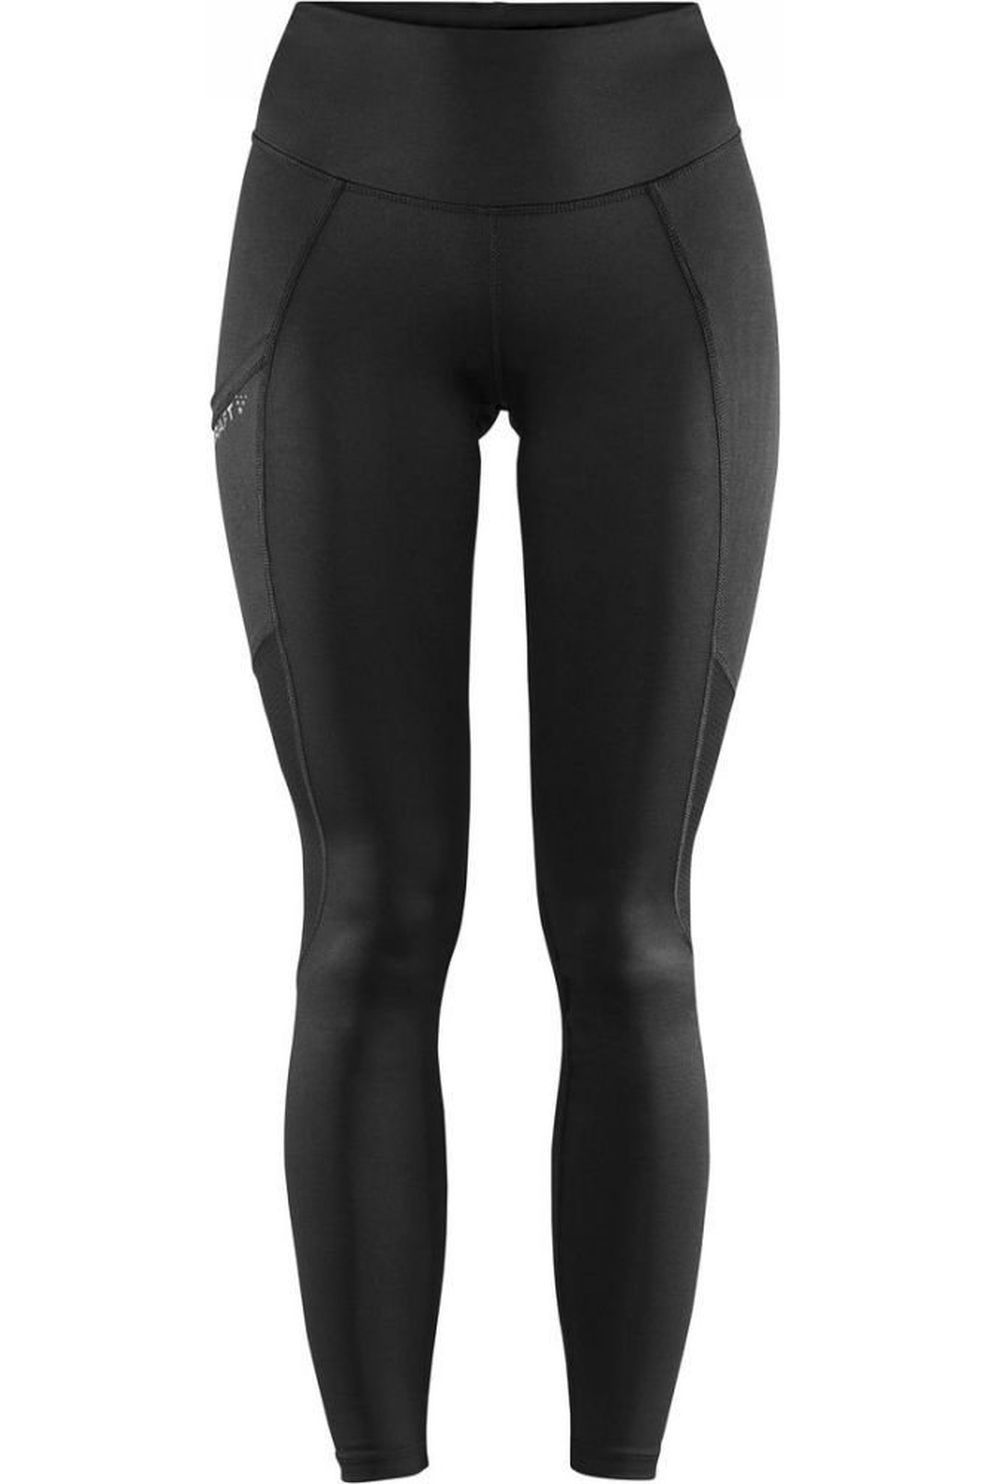 Craft Legging Adv Essence voor dames - Zwart - Maten: M, L, XL